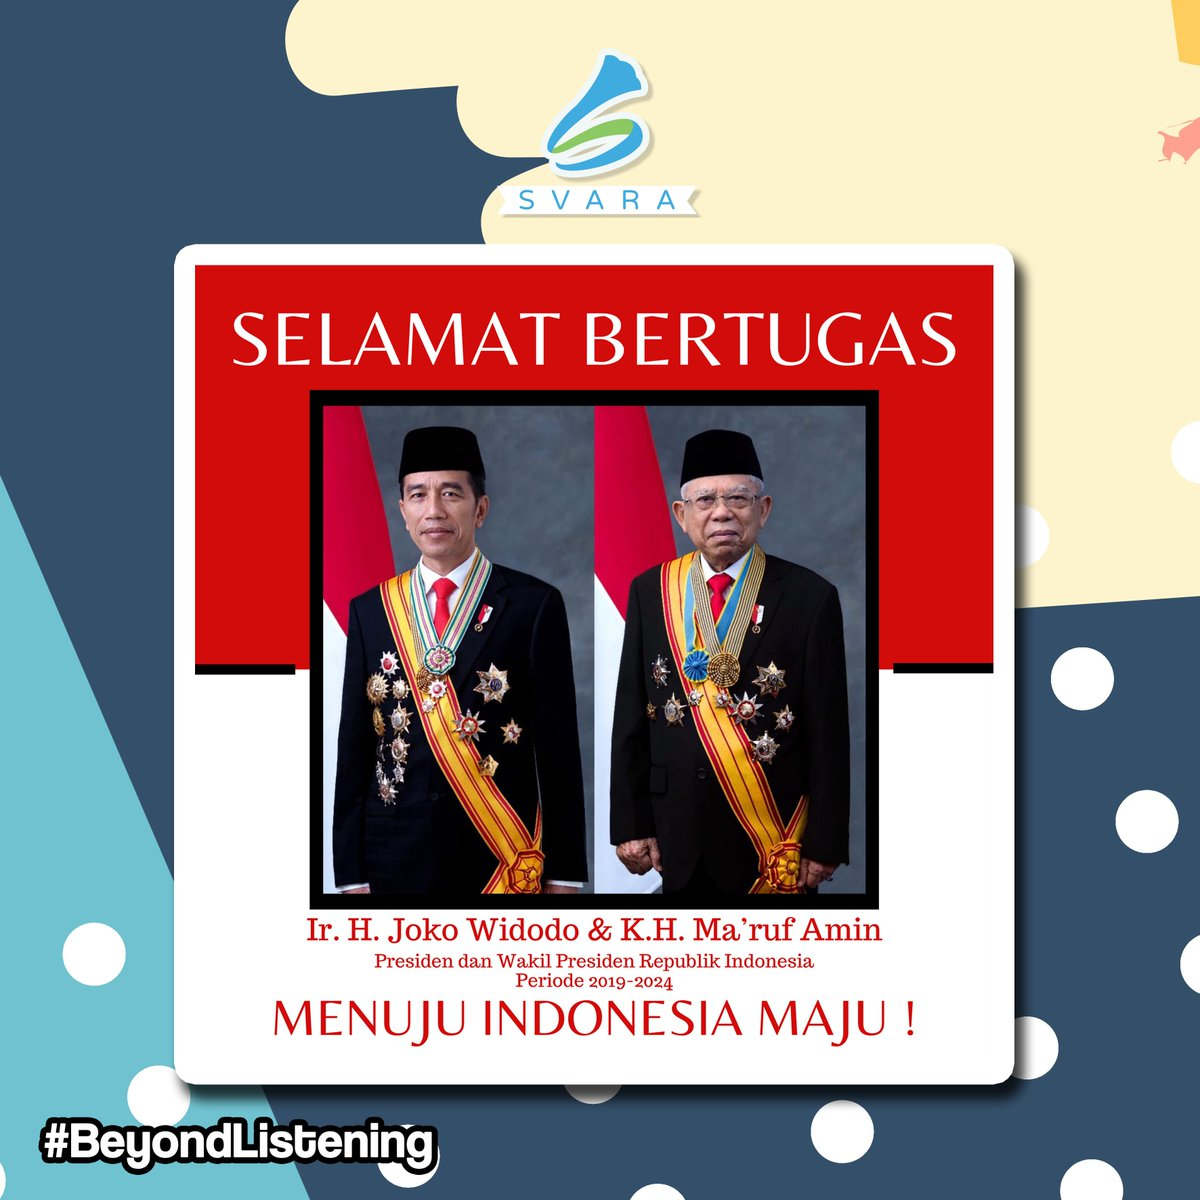 Selamat dan sukses kepada Ir. H. Joko Widodo dan Prof. Dr. (H.C.) K. H. Ma'ruf Amin sebagai Presiden dan Wakil Presiden Republik Indonesia 2019-2024 Beserta jajaran kabinet Indonesia Maju, Semoga tetap amanah menjalankan tugas untuk Indonesia yg lebih maju. . #beyondlistening pic.twitter.com/xgUImpt6zc